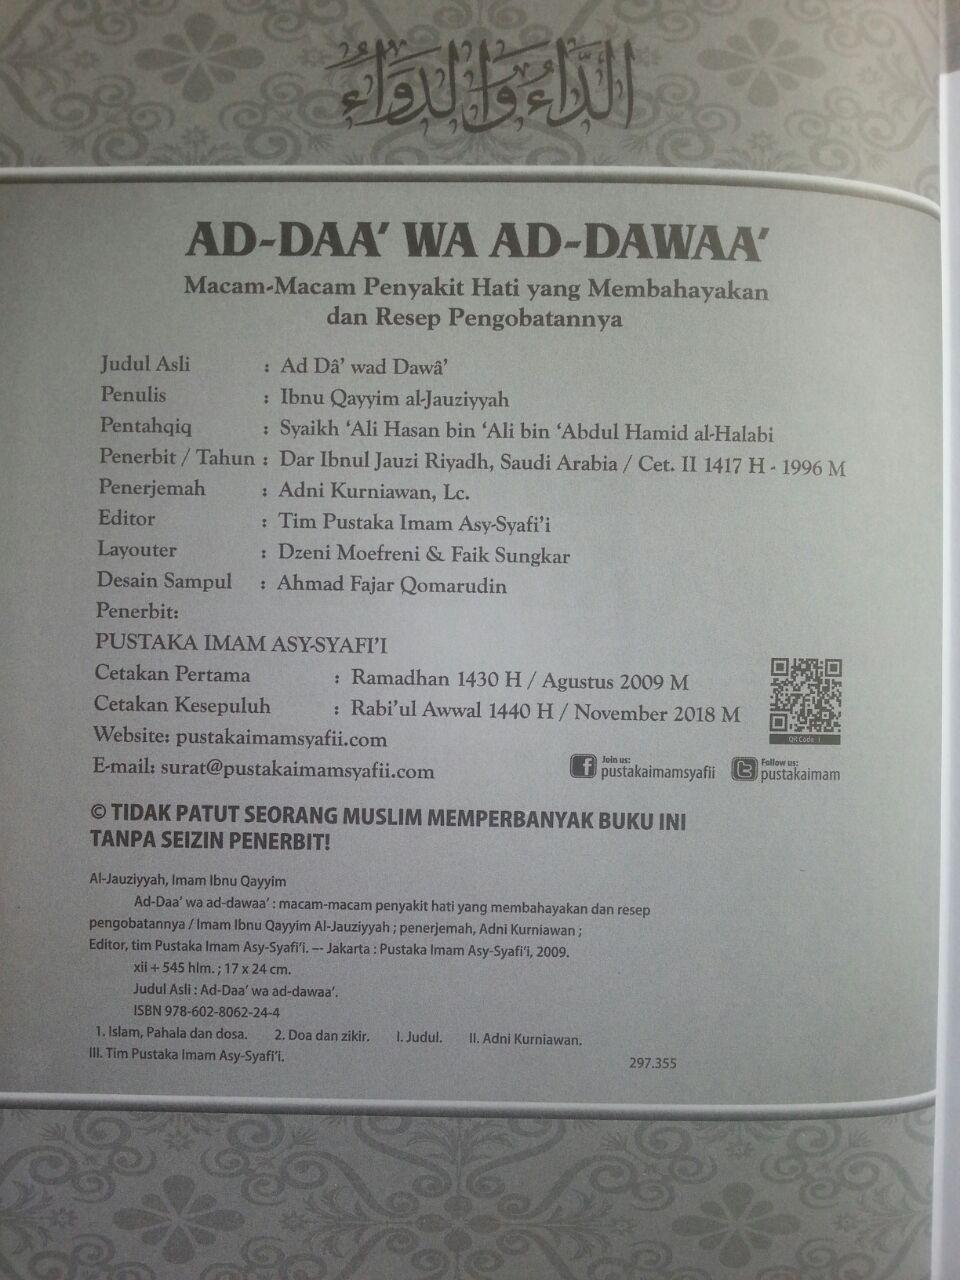 Buku Pengobatan Ad-Daa' wa ad-Dawaa' isi 3